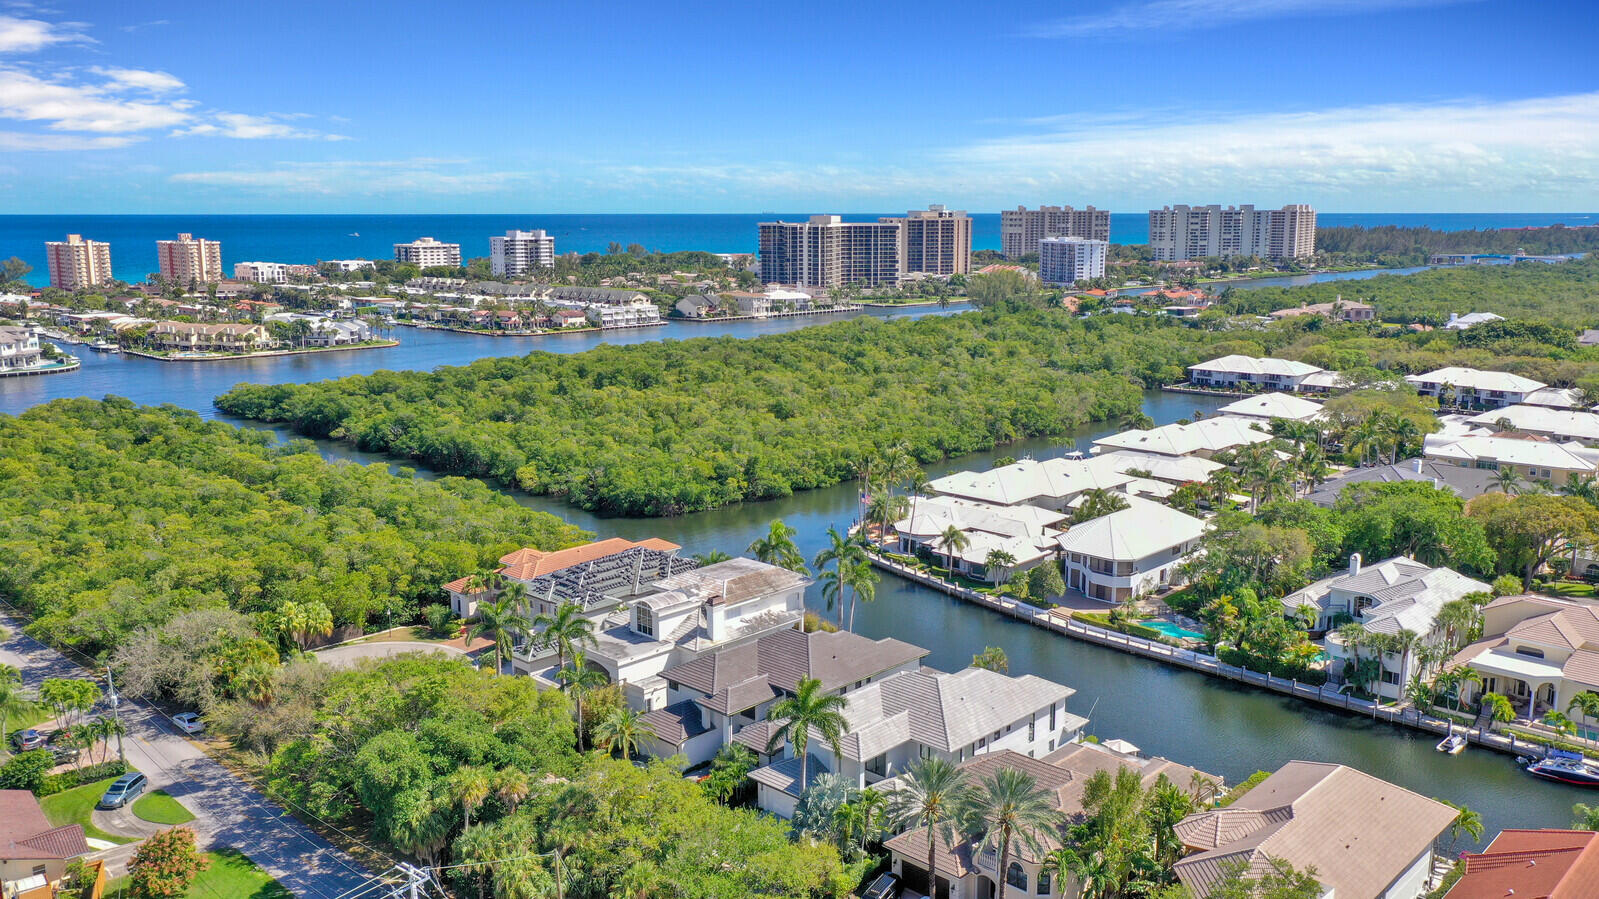 Photo of 5340 Boca Marina Circle N, Boca Raton, FL 33487